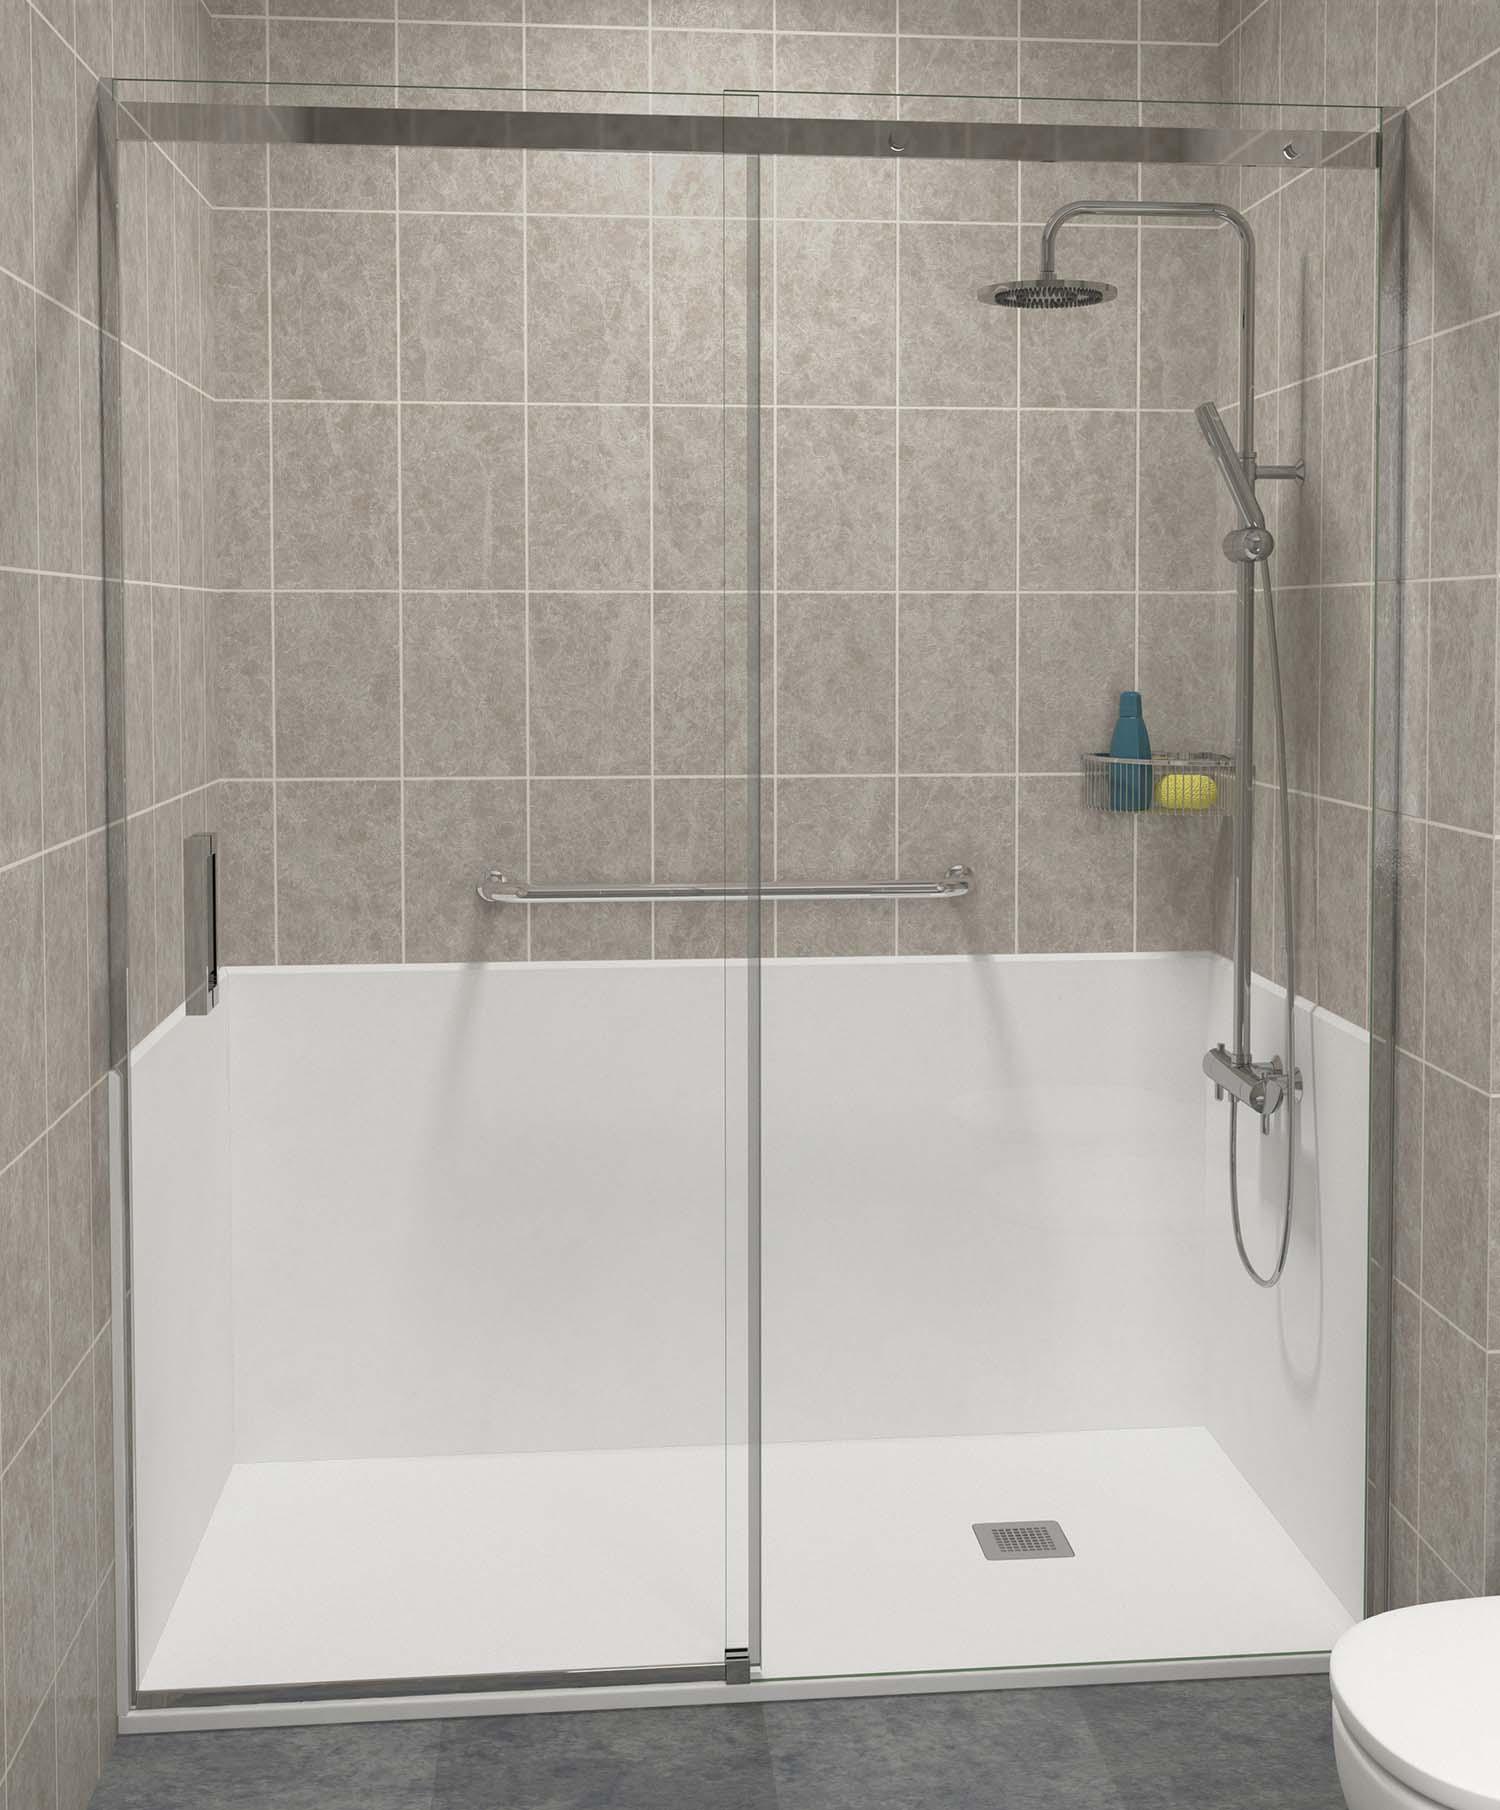 Transformar baera en ducha stunning perfect good cambio baera por plato de ducha with baera a - Convertir banera en ducha ...